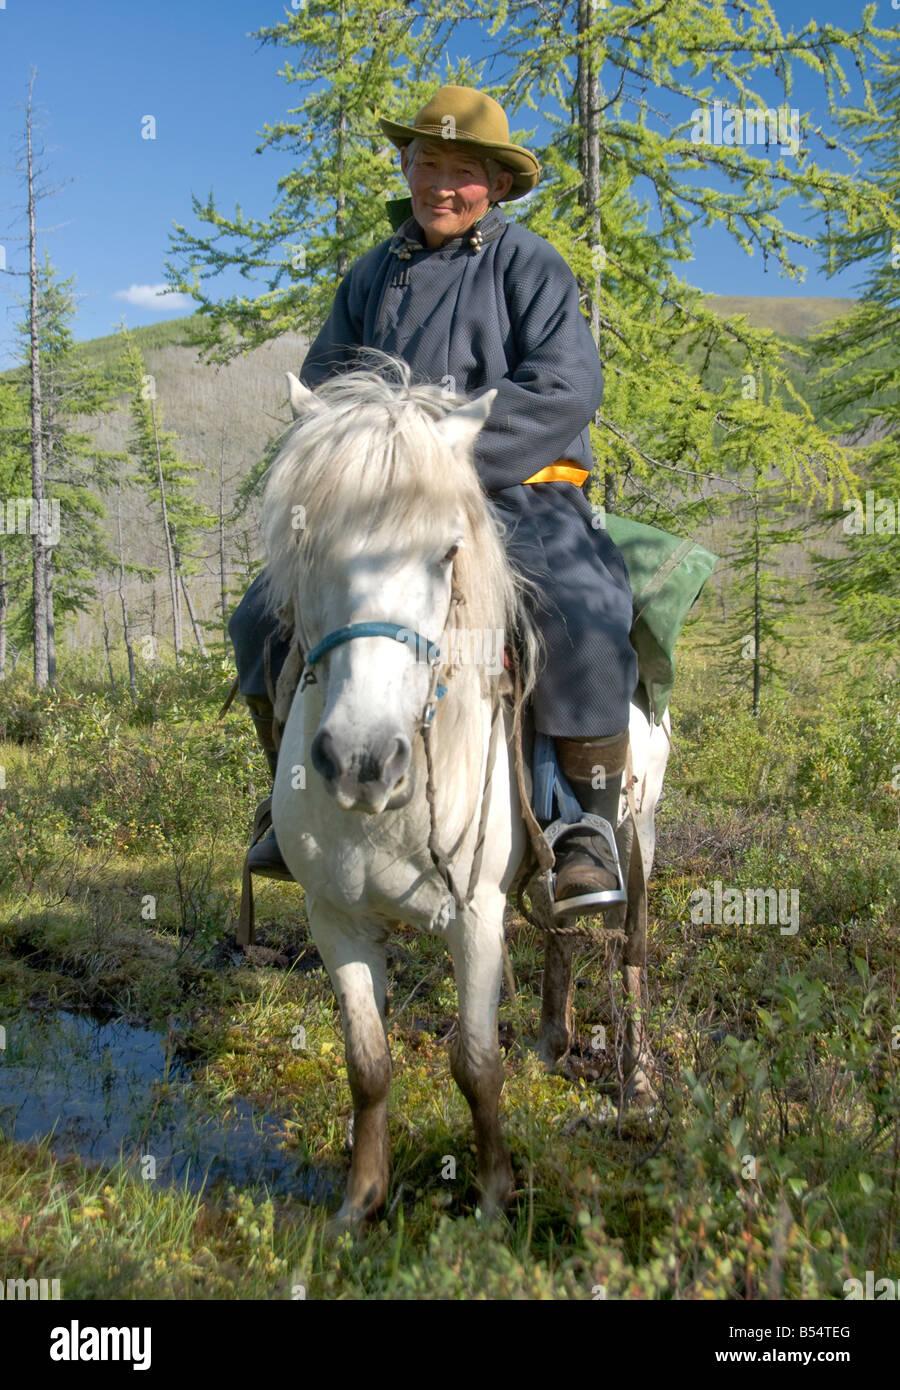 Mongolian Rider Northern Mongolia - Stock Image